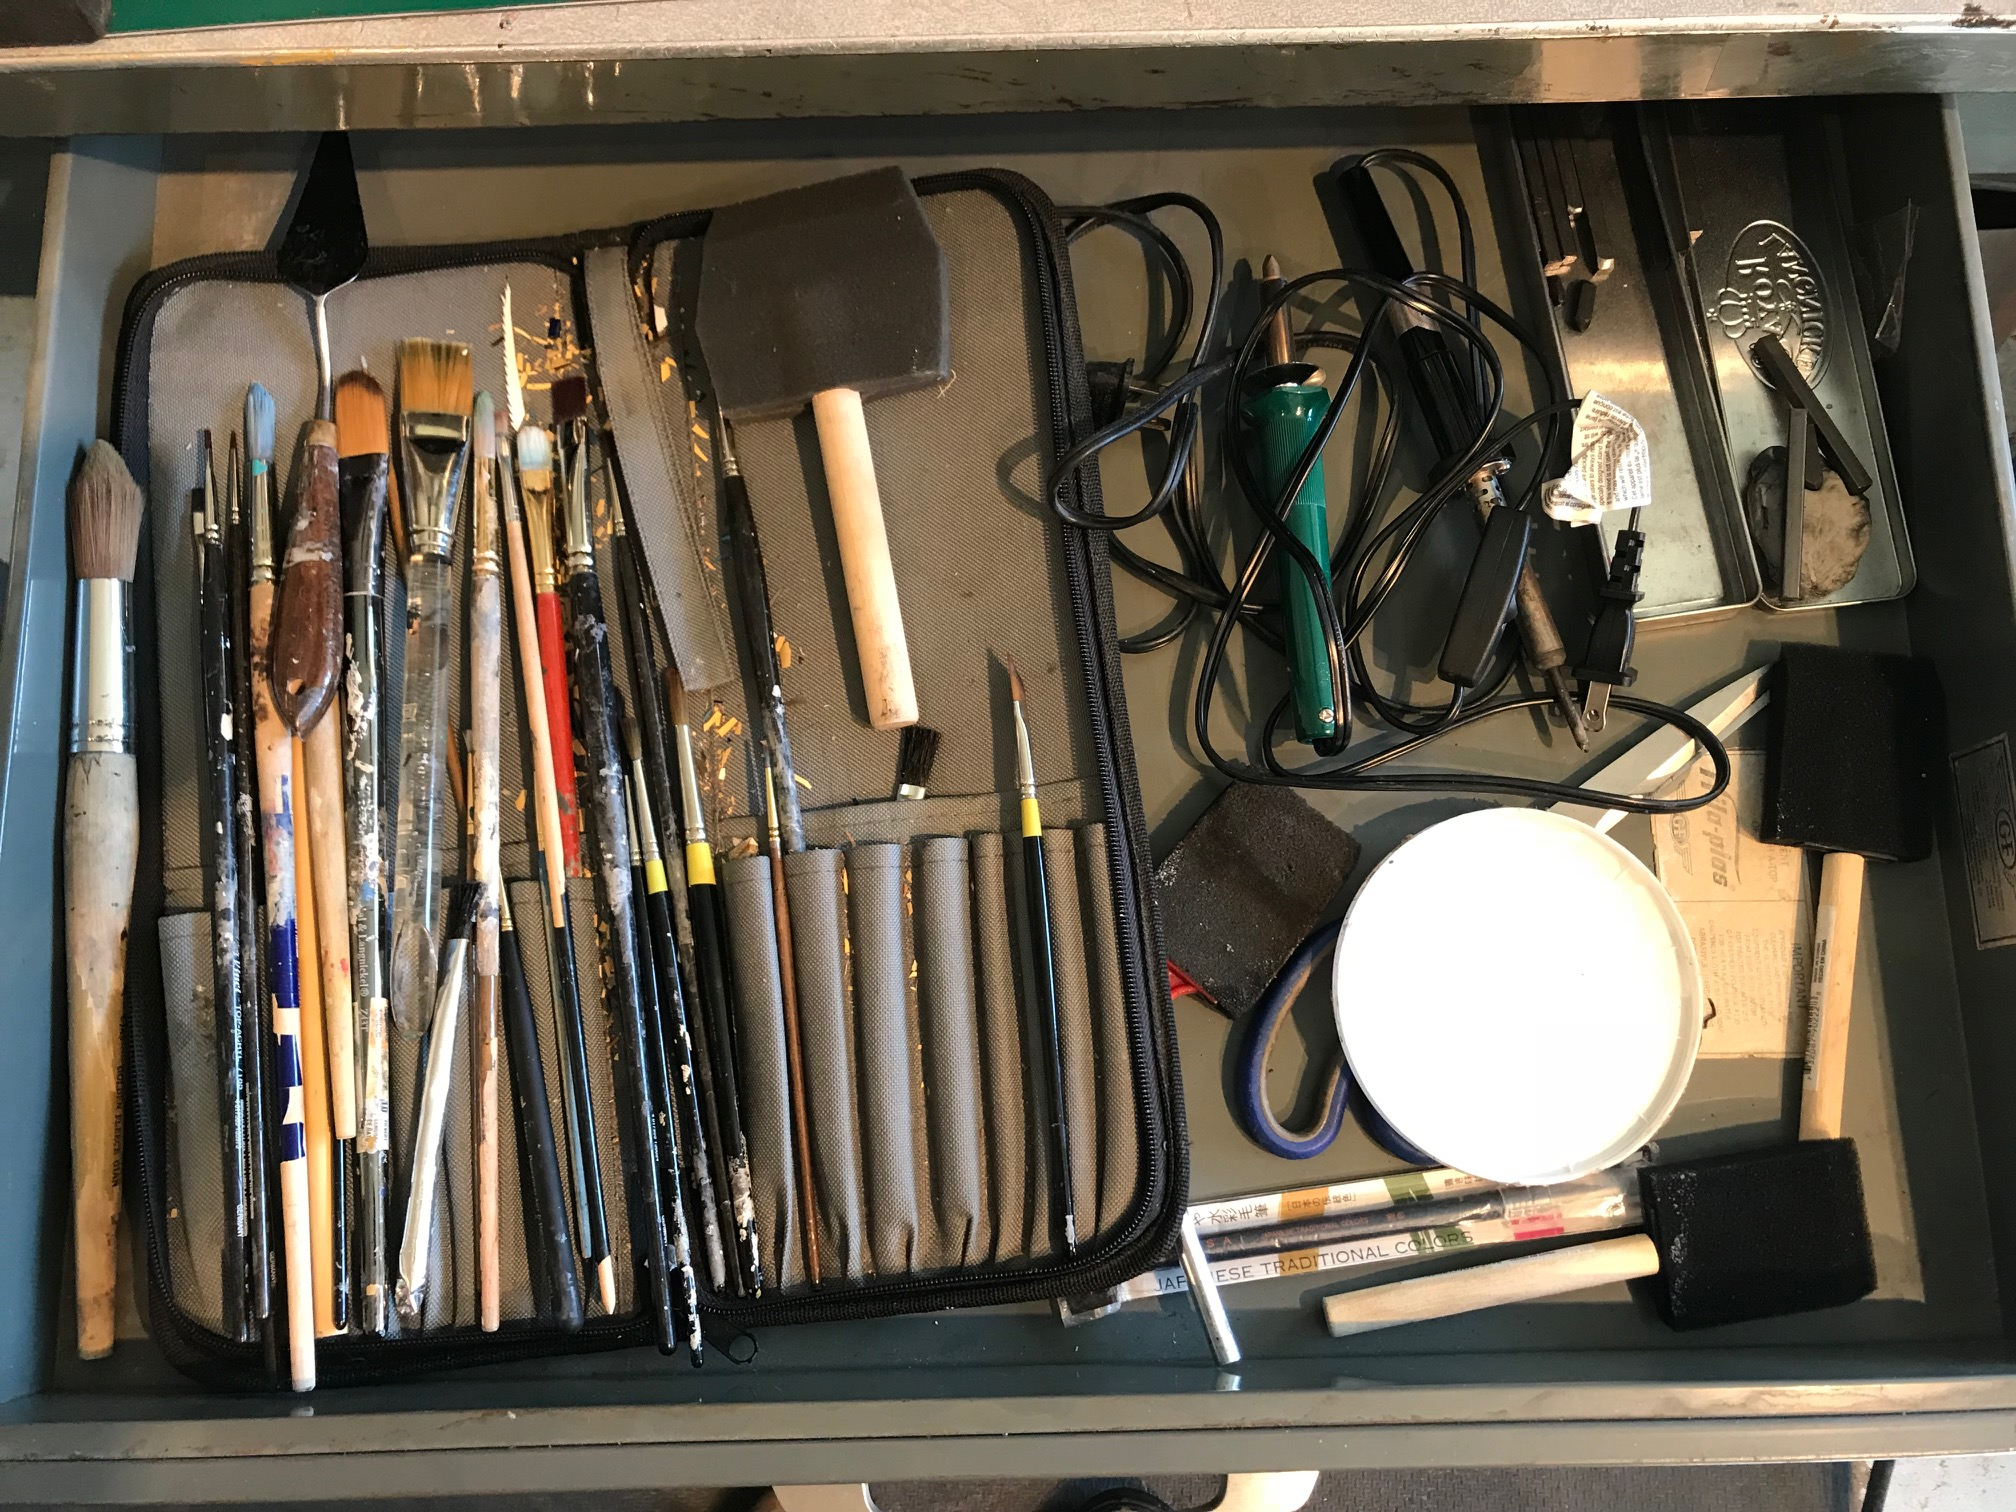 Tools of the trade | Glenn, MI